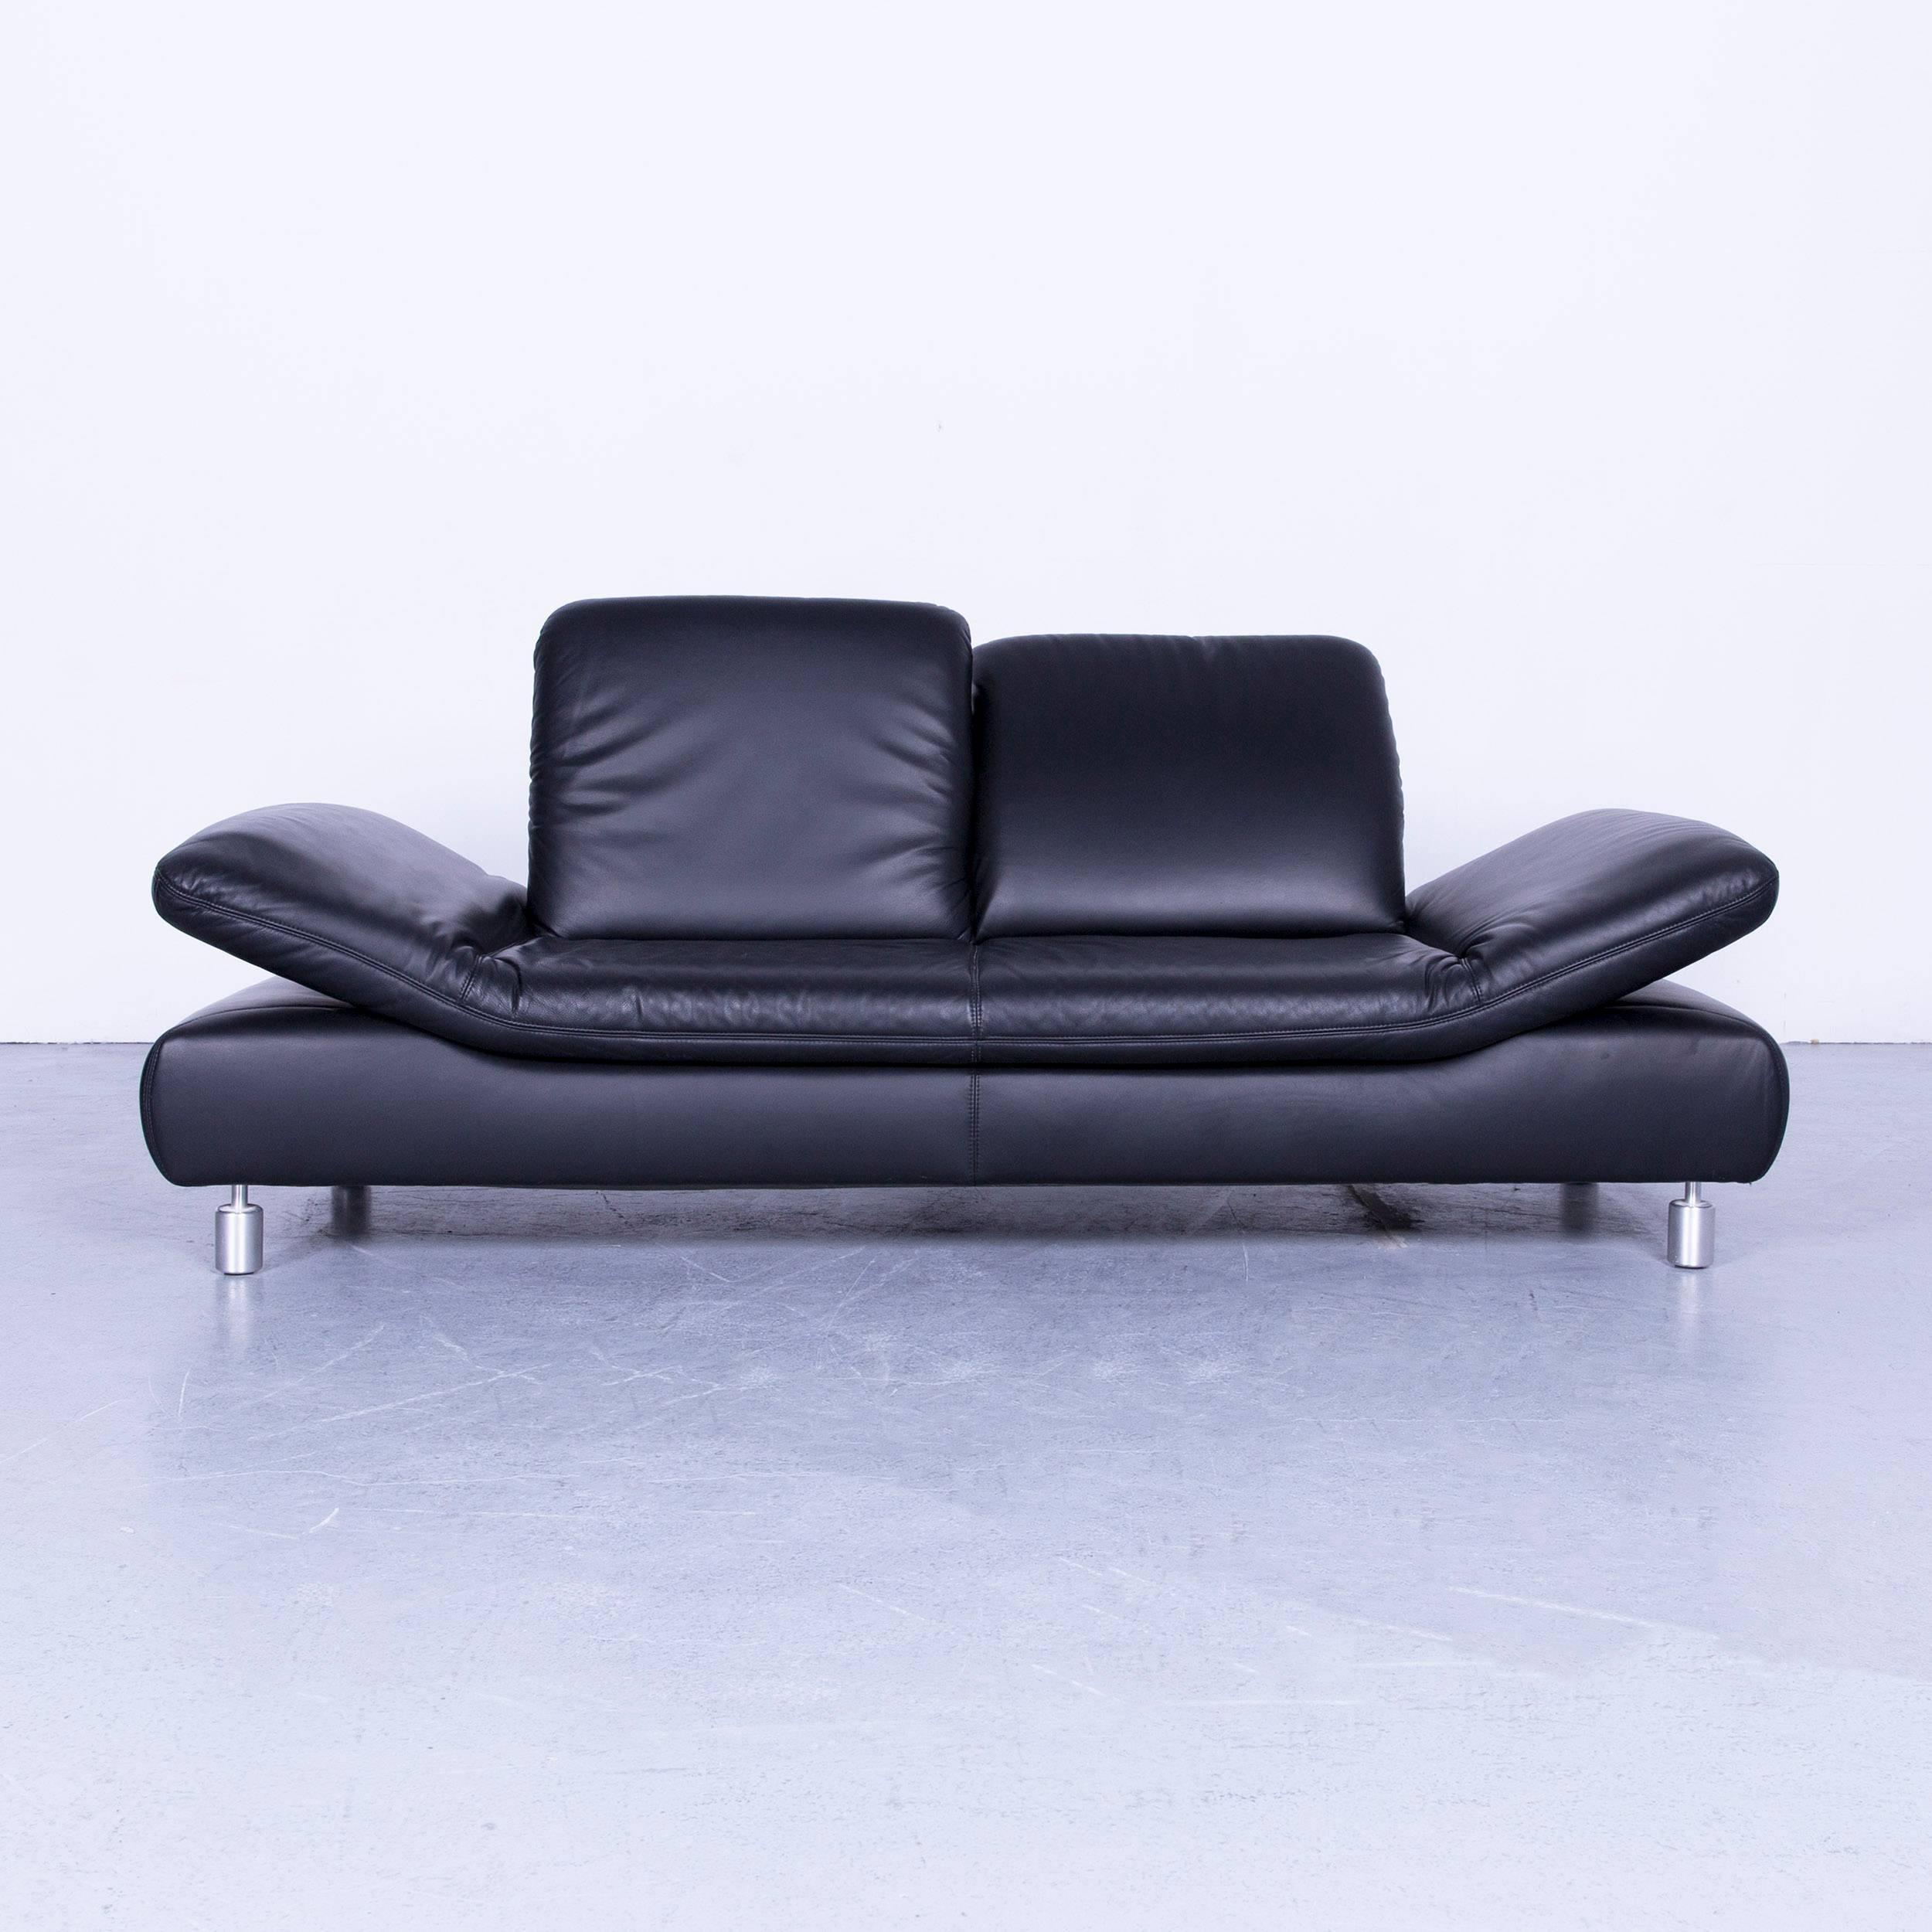 Phenomenal Koinor Rivoli Leather Sofa Set Black Two Seat Couch Pdpeps Interior Chair Design Pdpepsorg